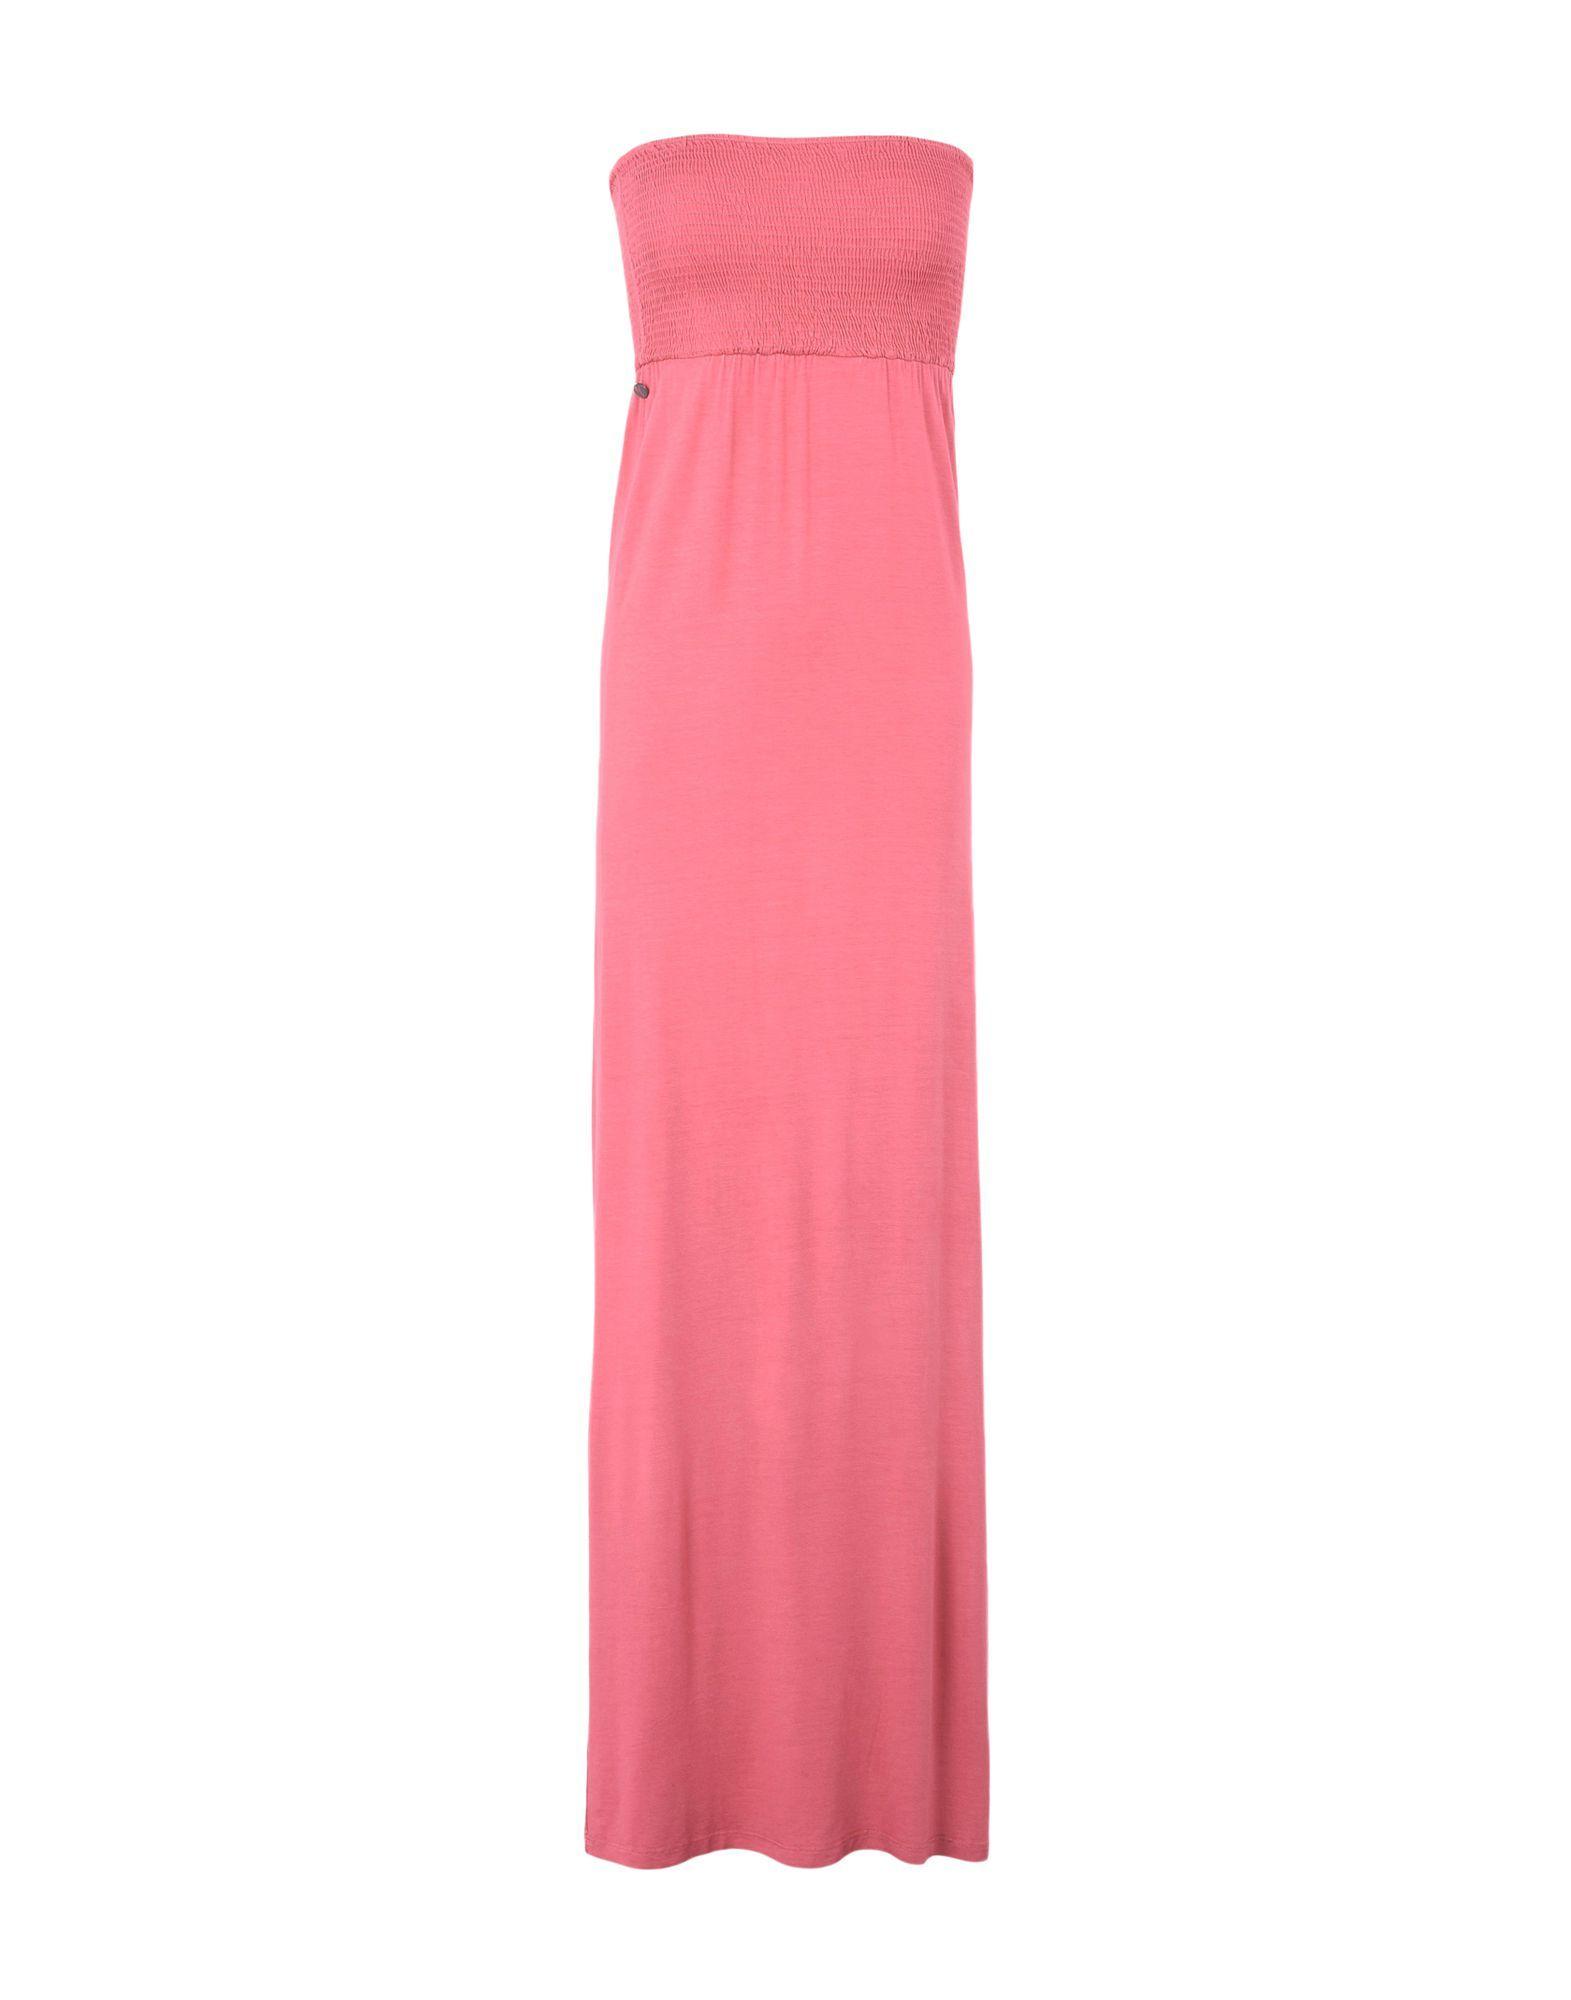 Manila Grace Denim Coral Jersey Strapless Dress